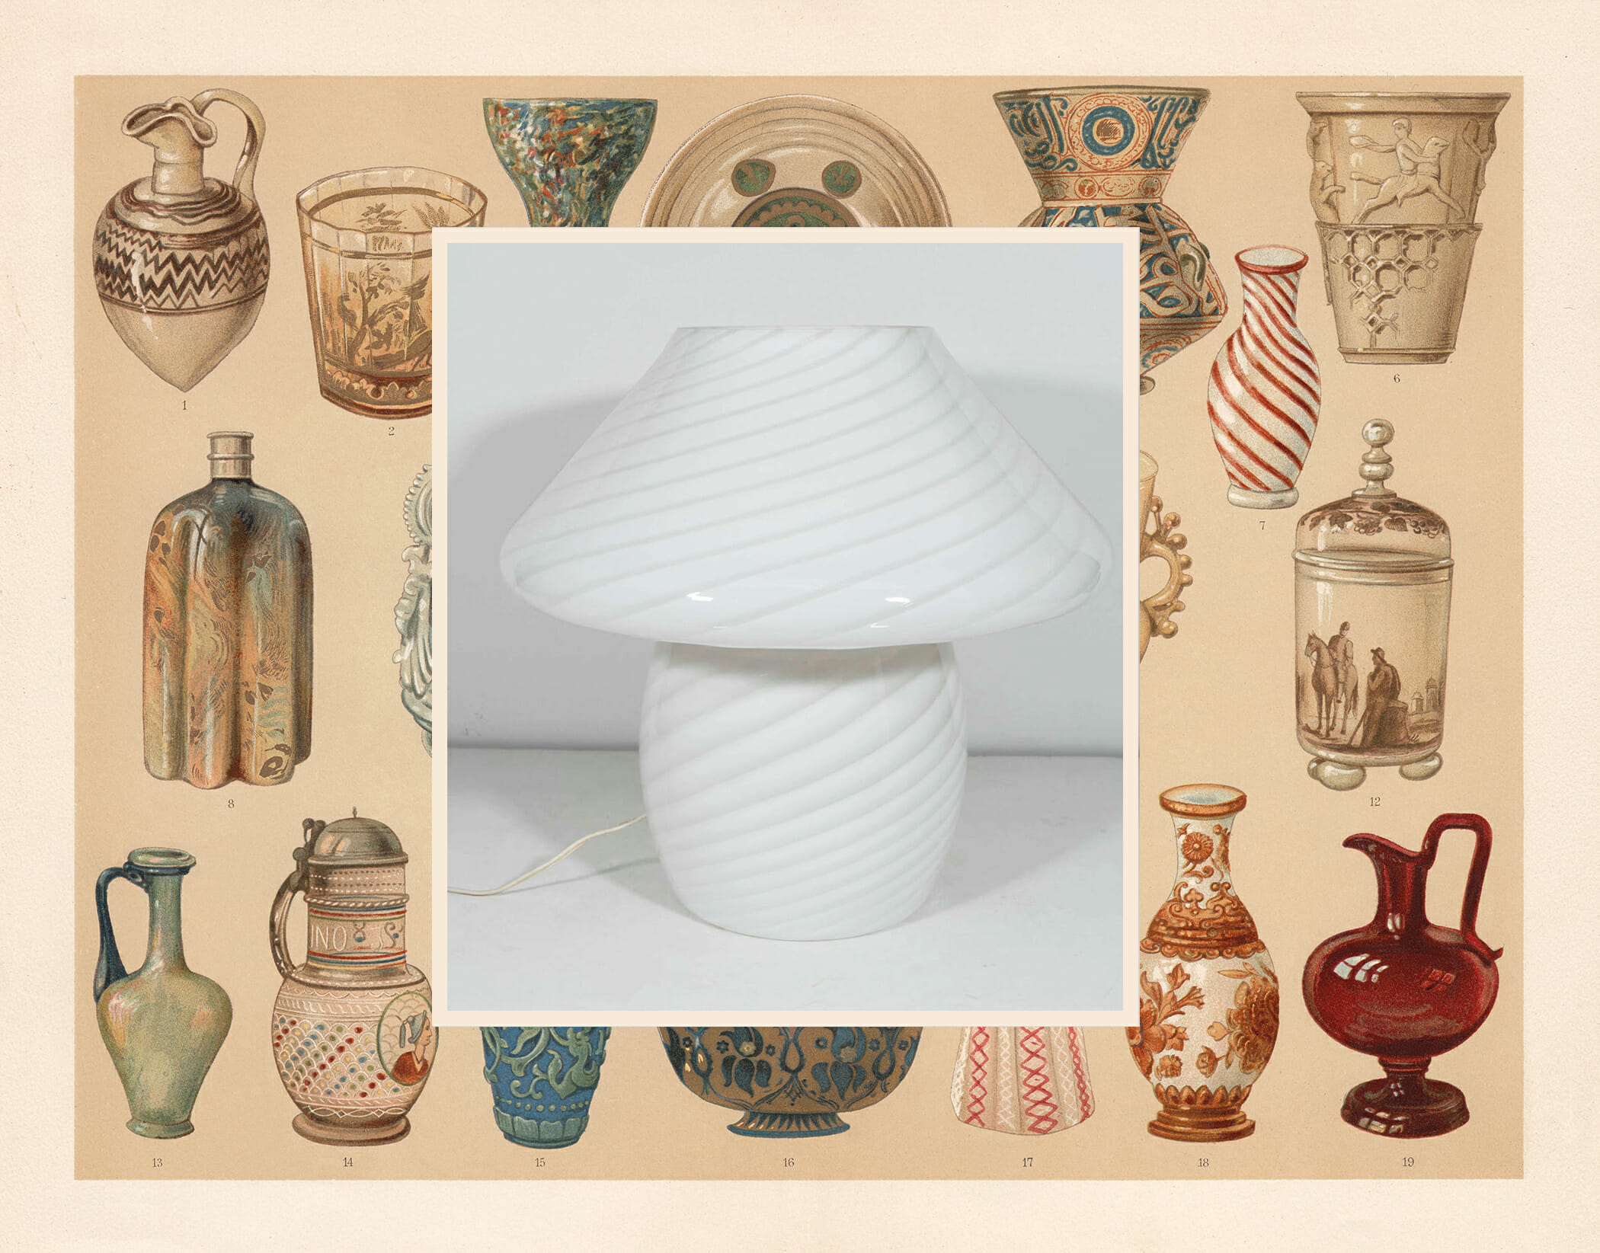 Vintage-murano-glass-mushroom-lamp-man-repeller-1.jpg